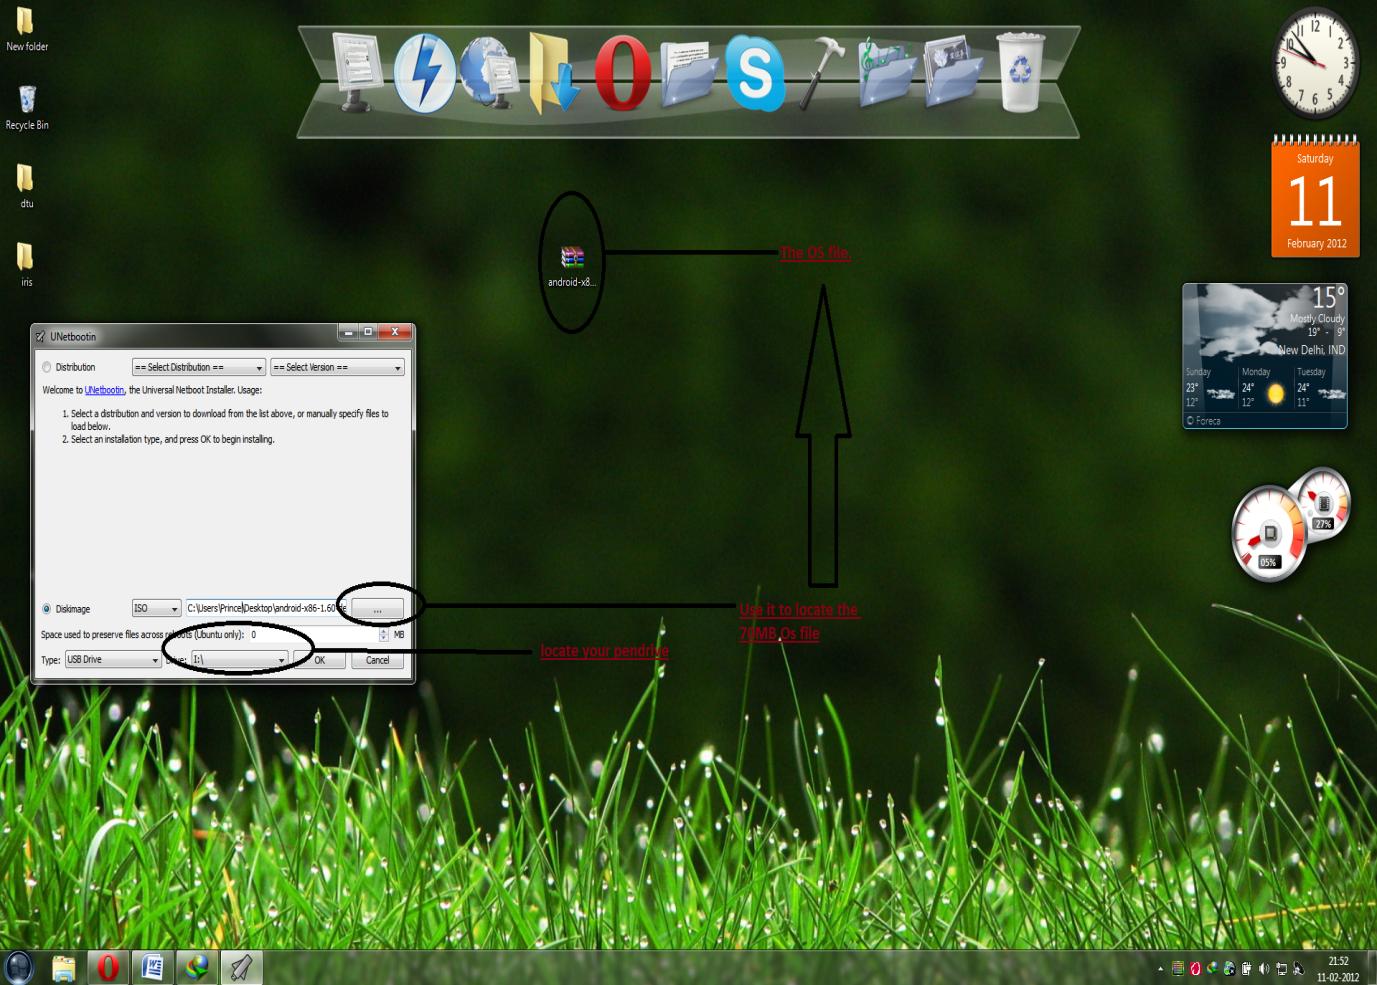 Androidify your PC – techiris_